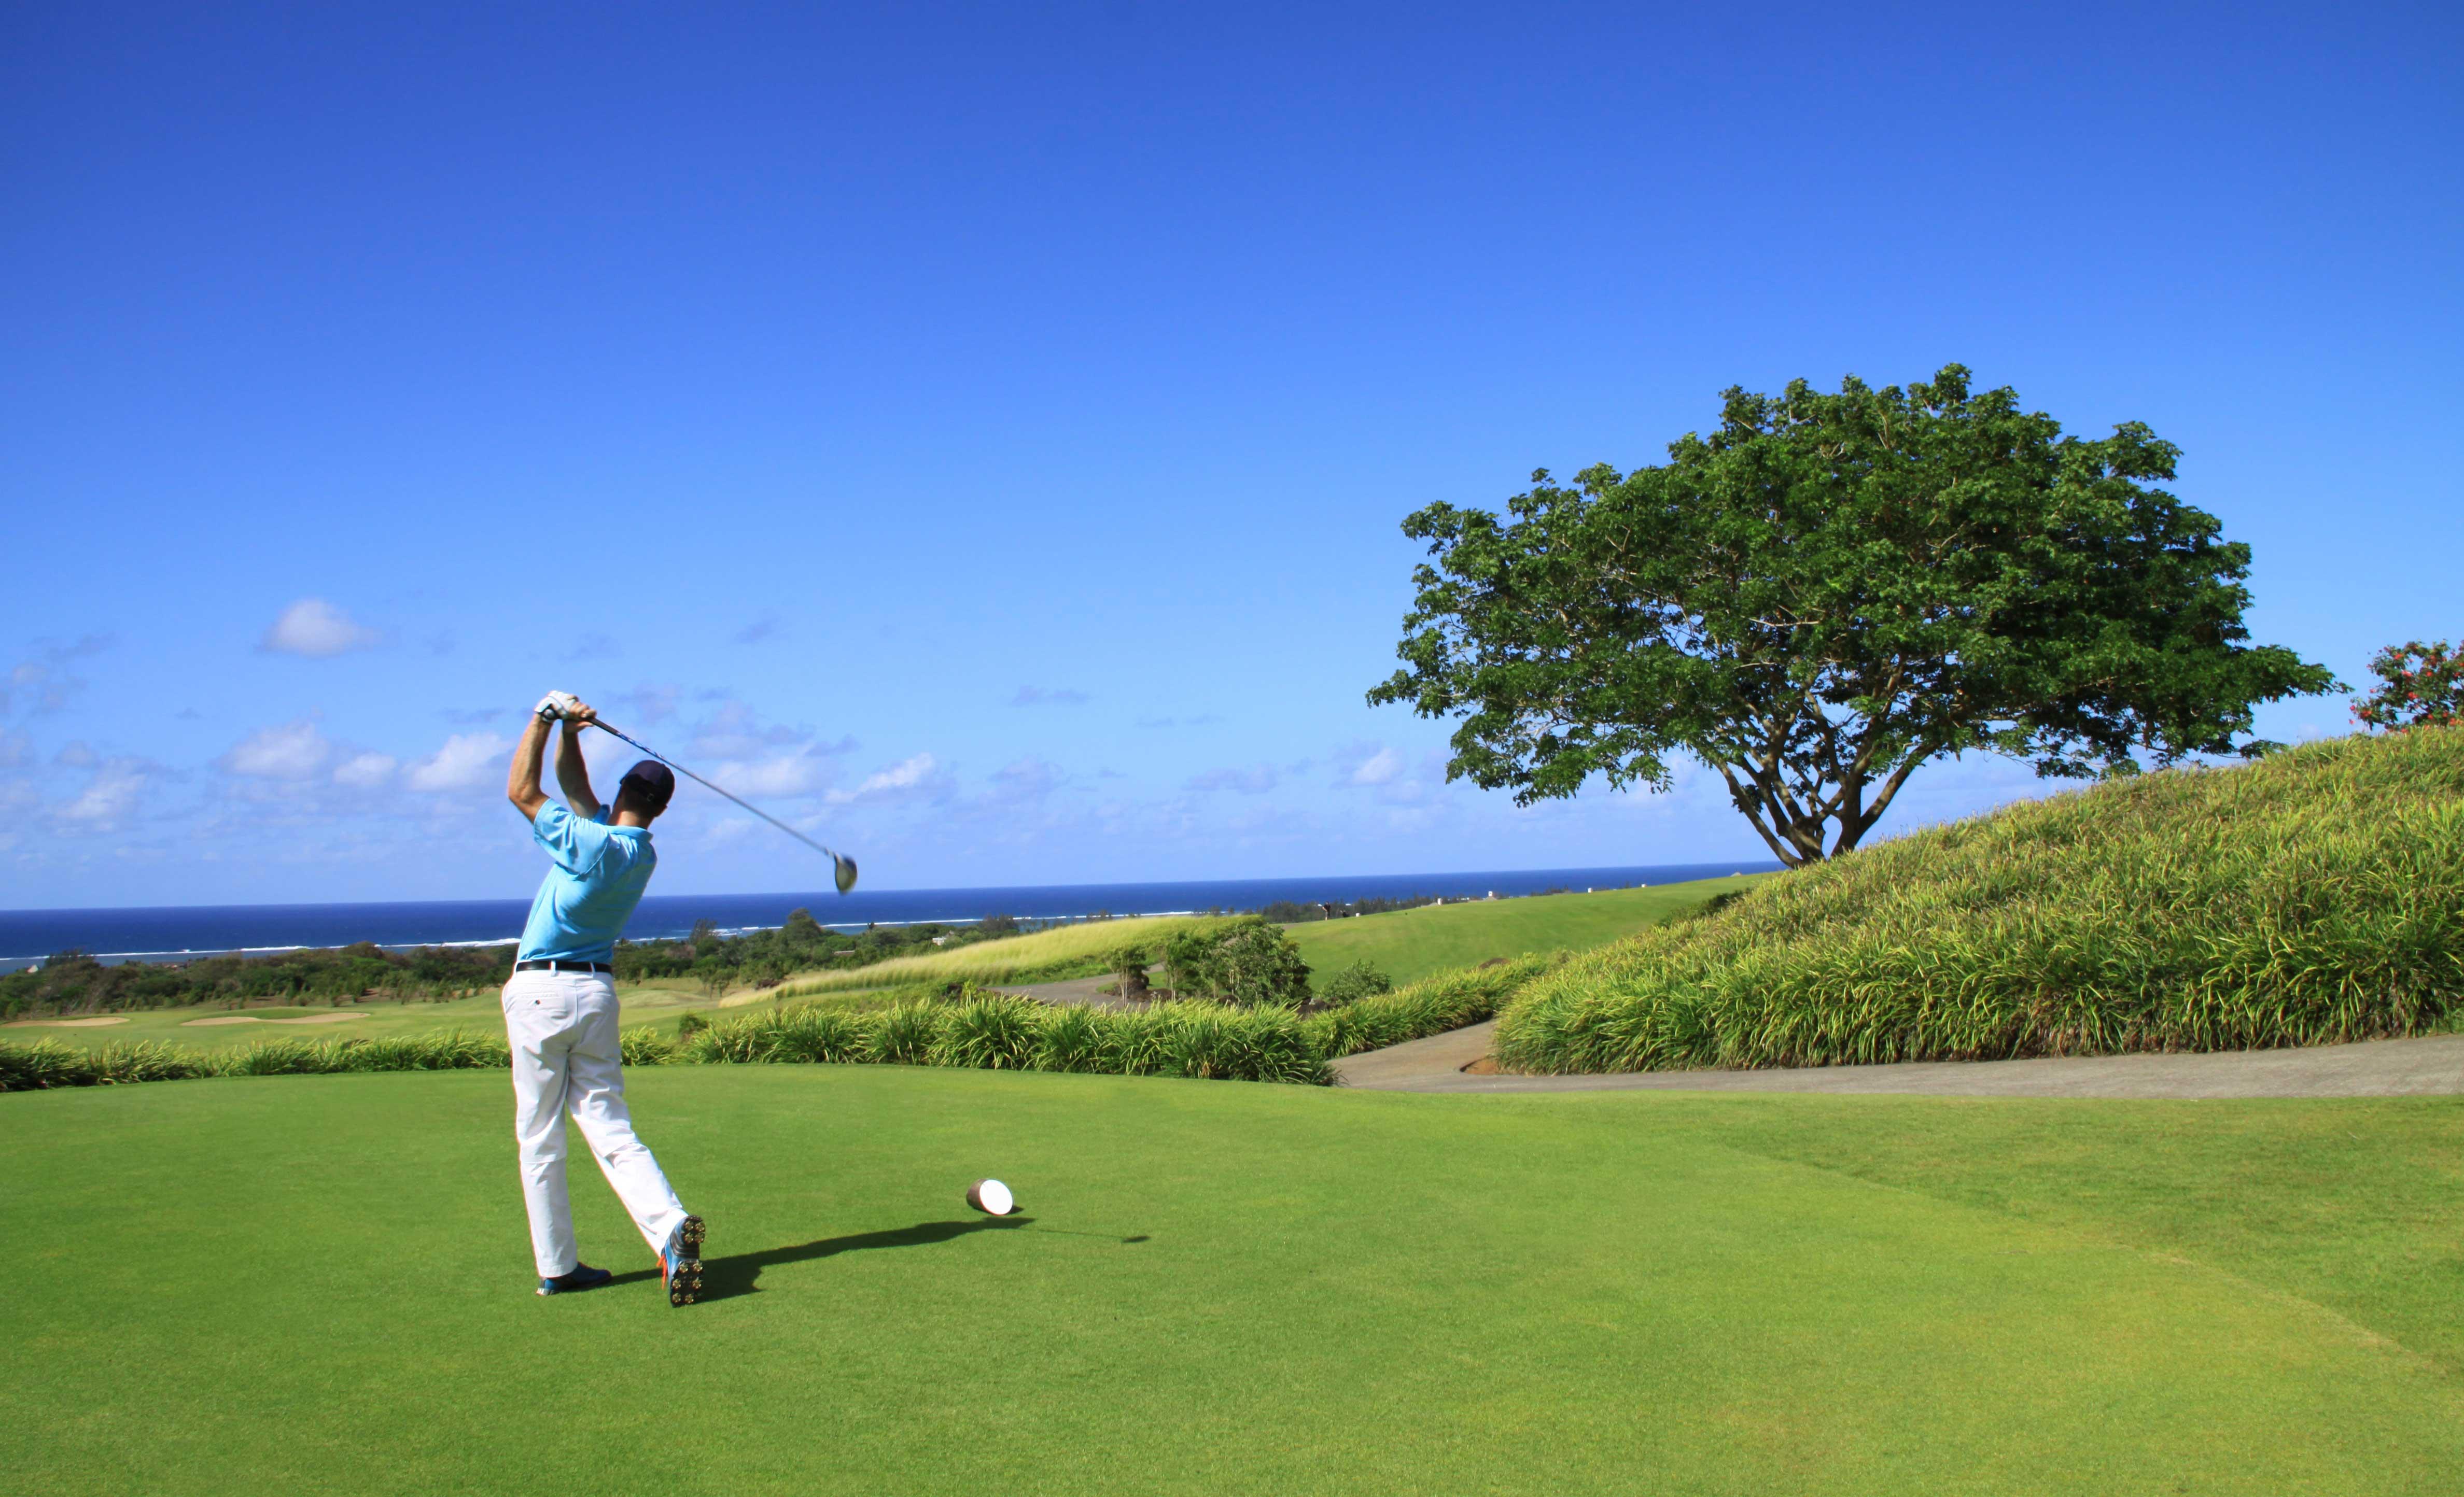 heritage golf club du ch teau l 39 le maurice mauritius. Black Bedroom Furniture Sets. Home Design Ideas